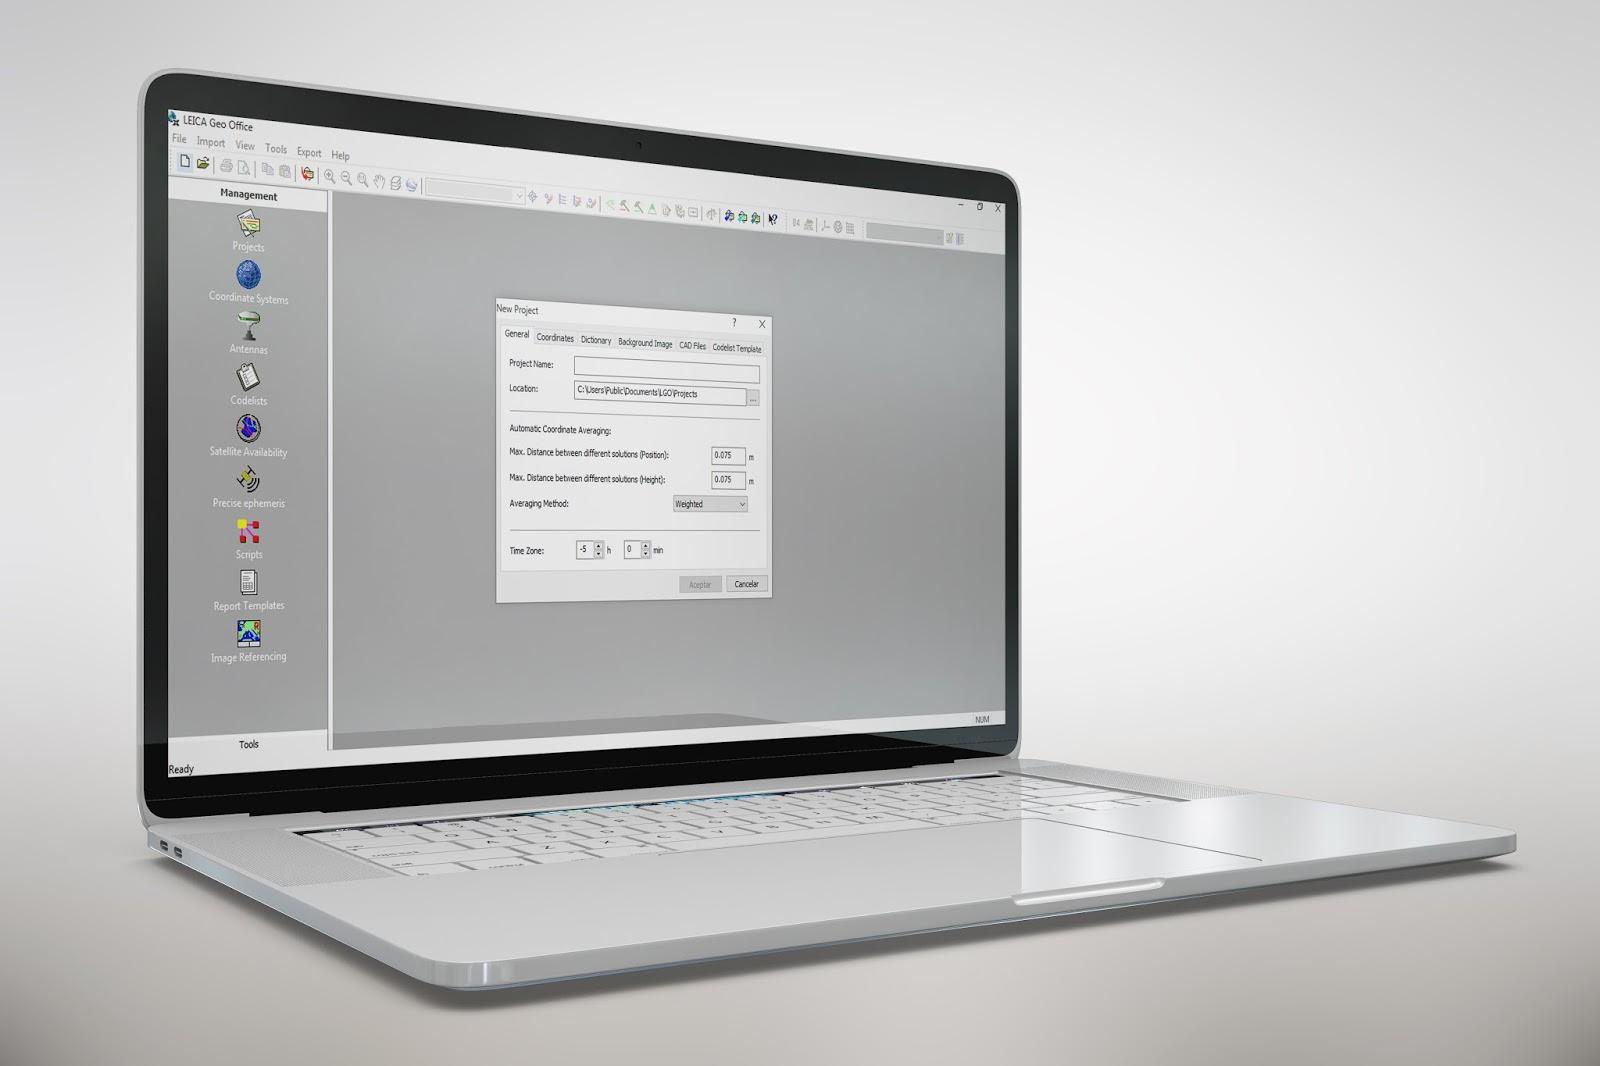 Intex It 305Wc Driver For Windows 7 64 Bit Free Download